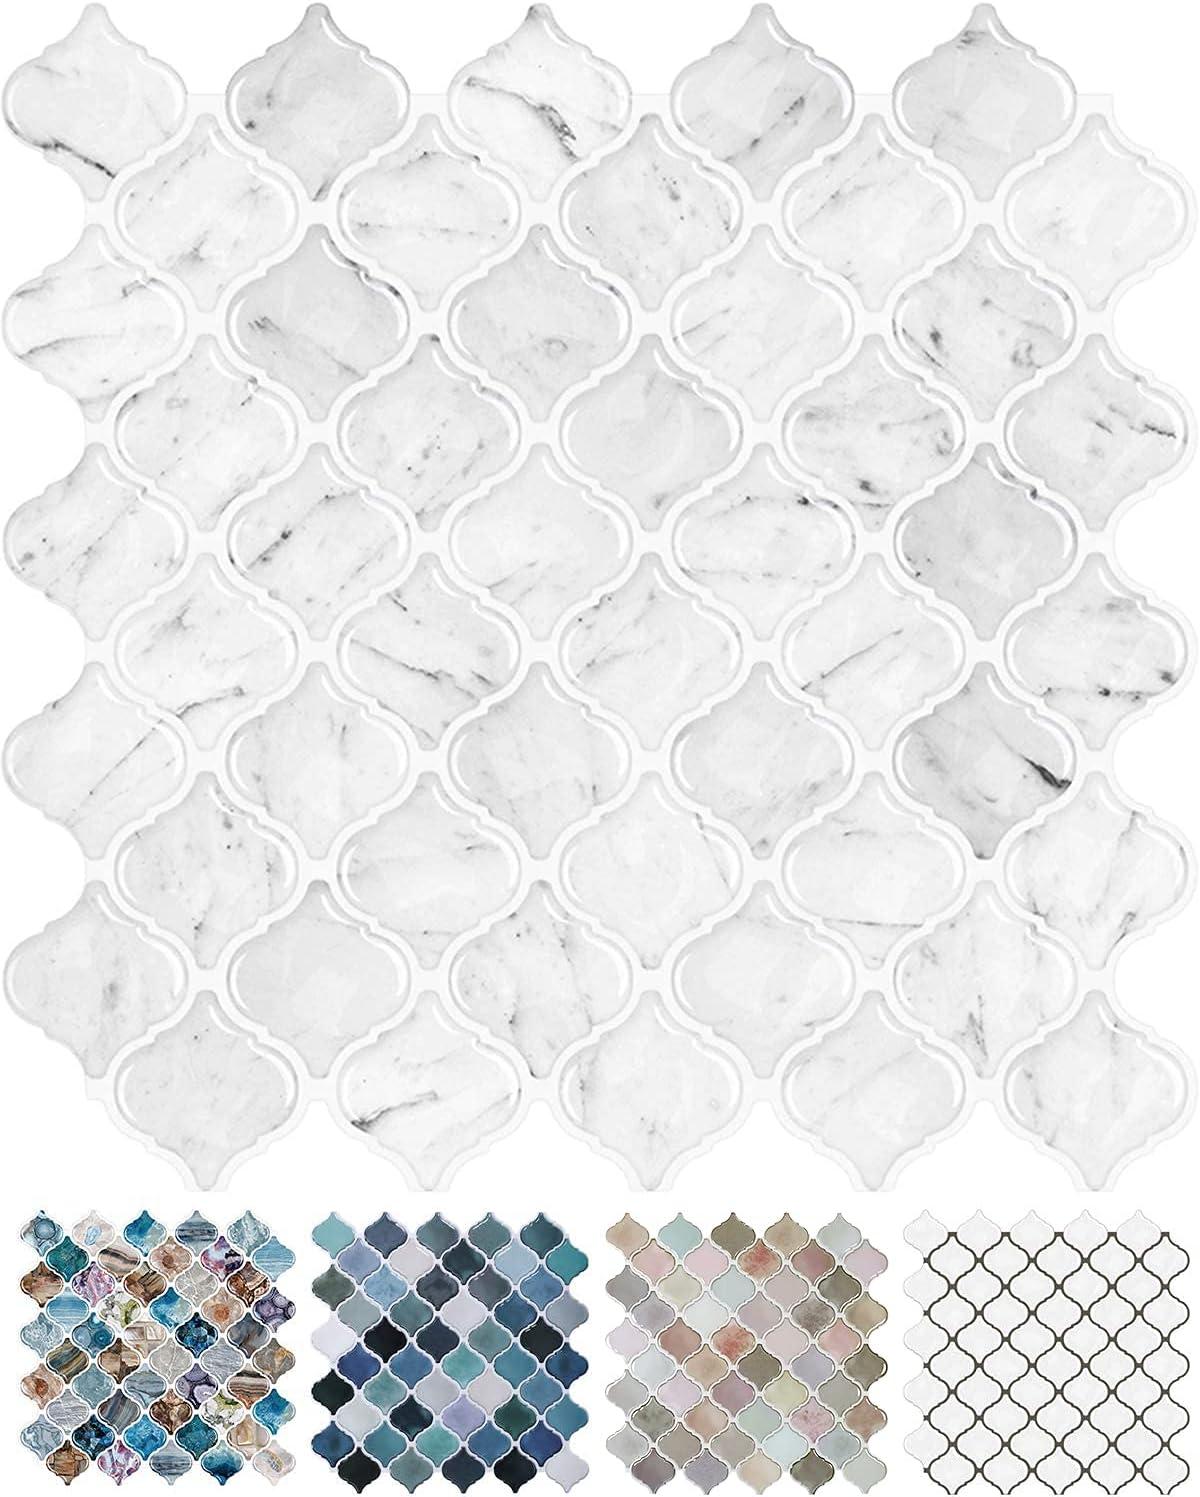 STICKGOO Max 47% OFF 10-Sheet Carrara Arabesque Quality inspection Tile Peel Backsplash Stick